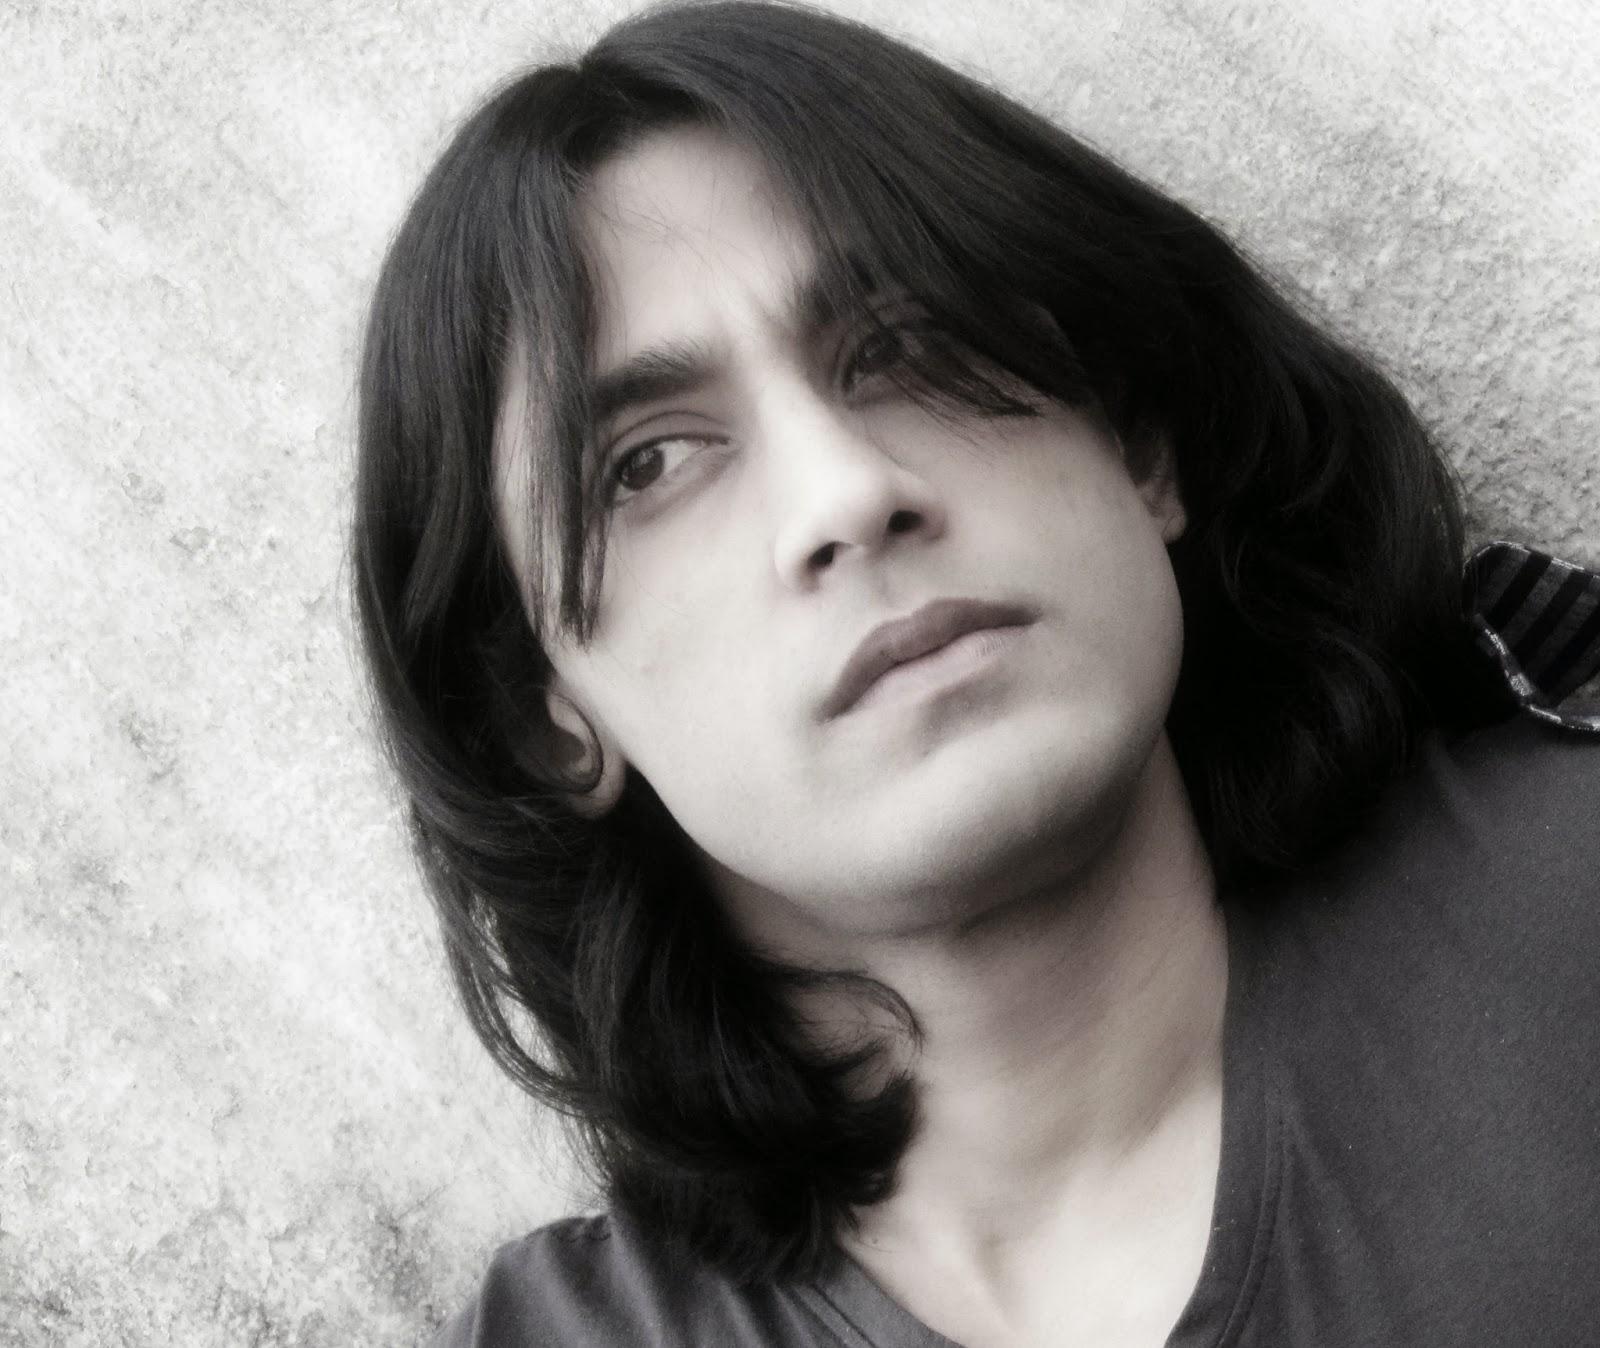 Rajkumar Patra Long Hairstyle fashion & attractive eye expression